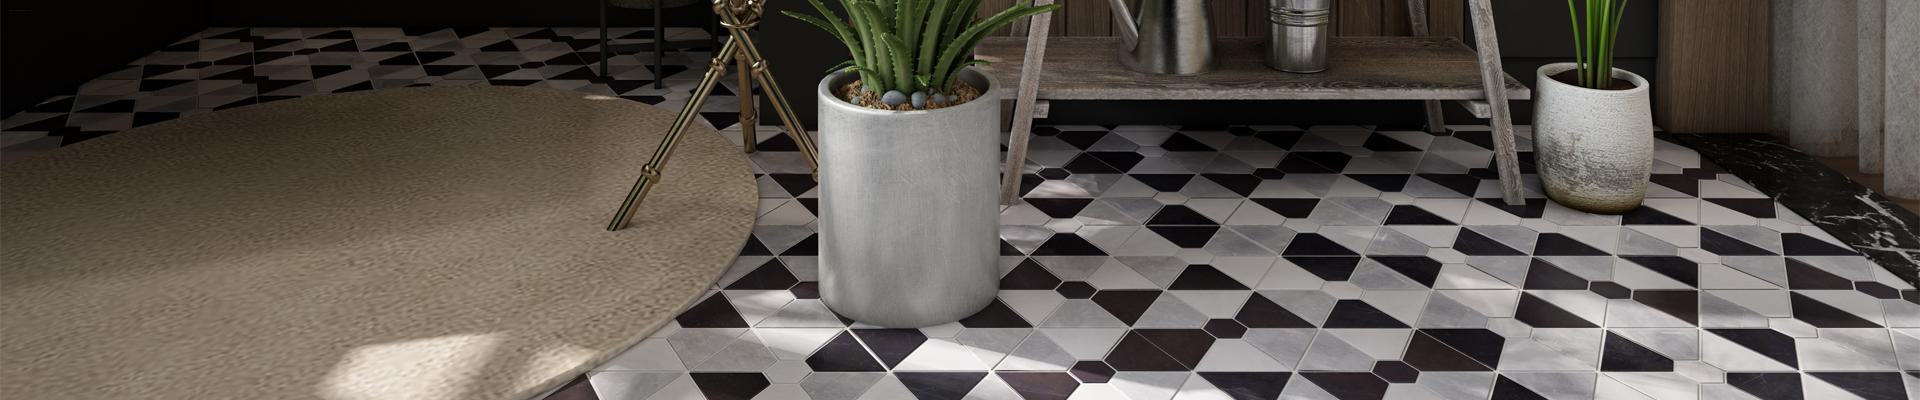 HSC48 Brown Mixed Gray Arrow Stone Mosaic Floor Tile-Heng Xing